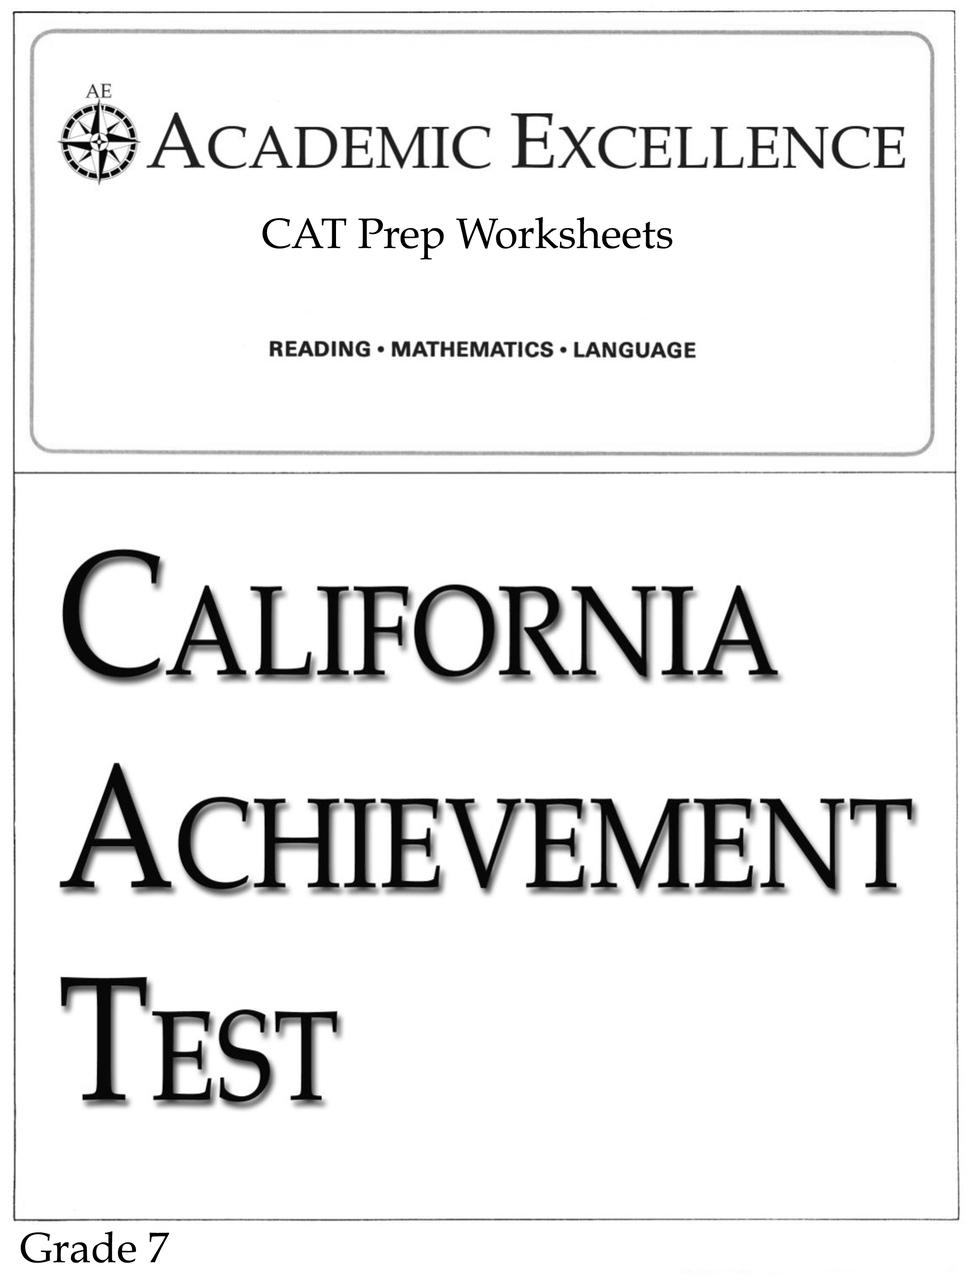 medium resolution of CAT Prep Pack: Grade 7 - PDF Download - Academic Excellence